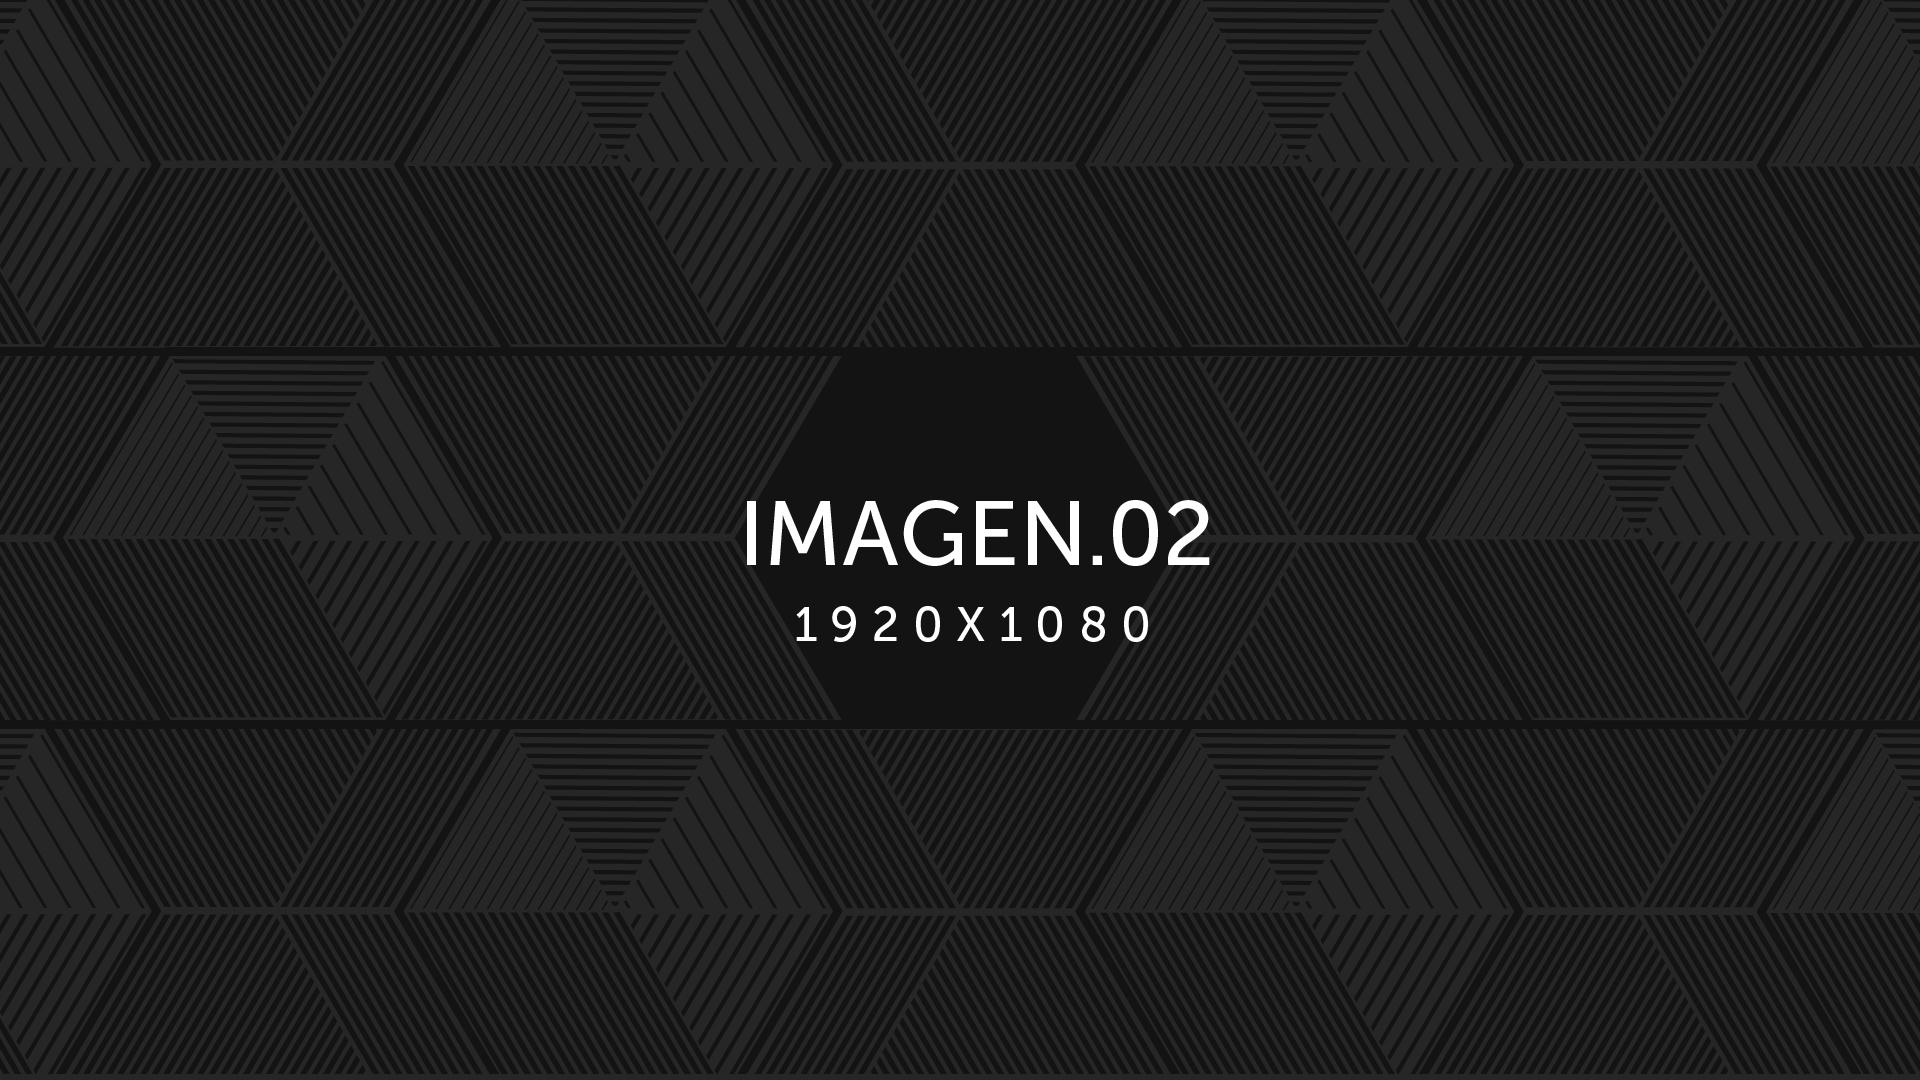 PB_Imagen02_1920x1080.jpg